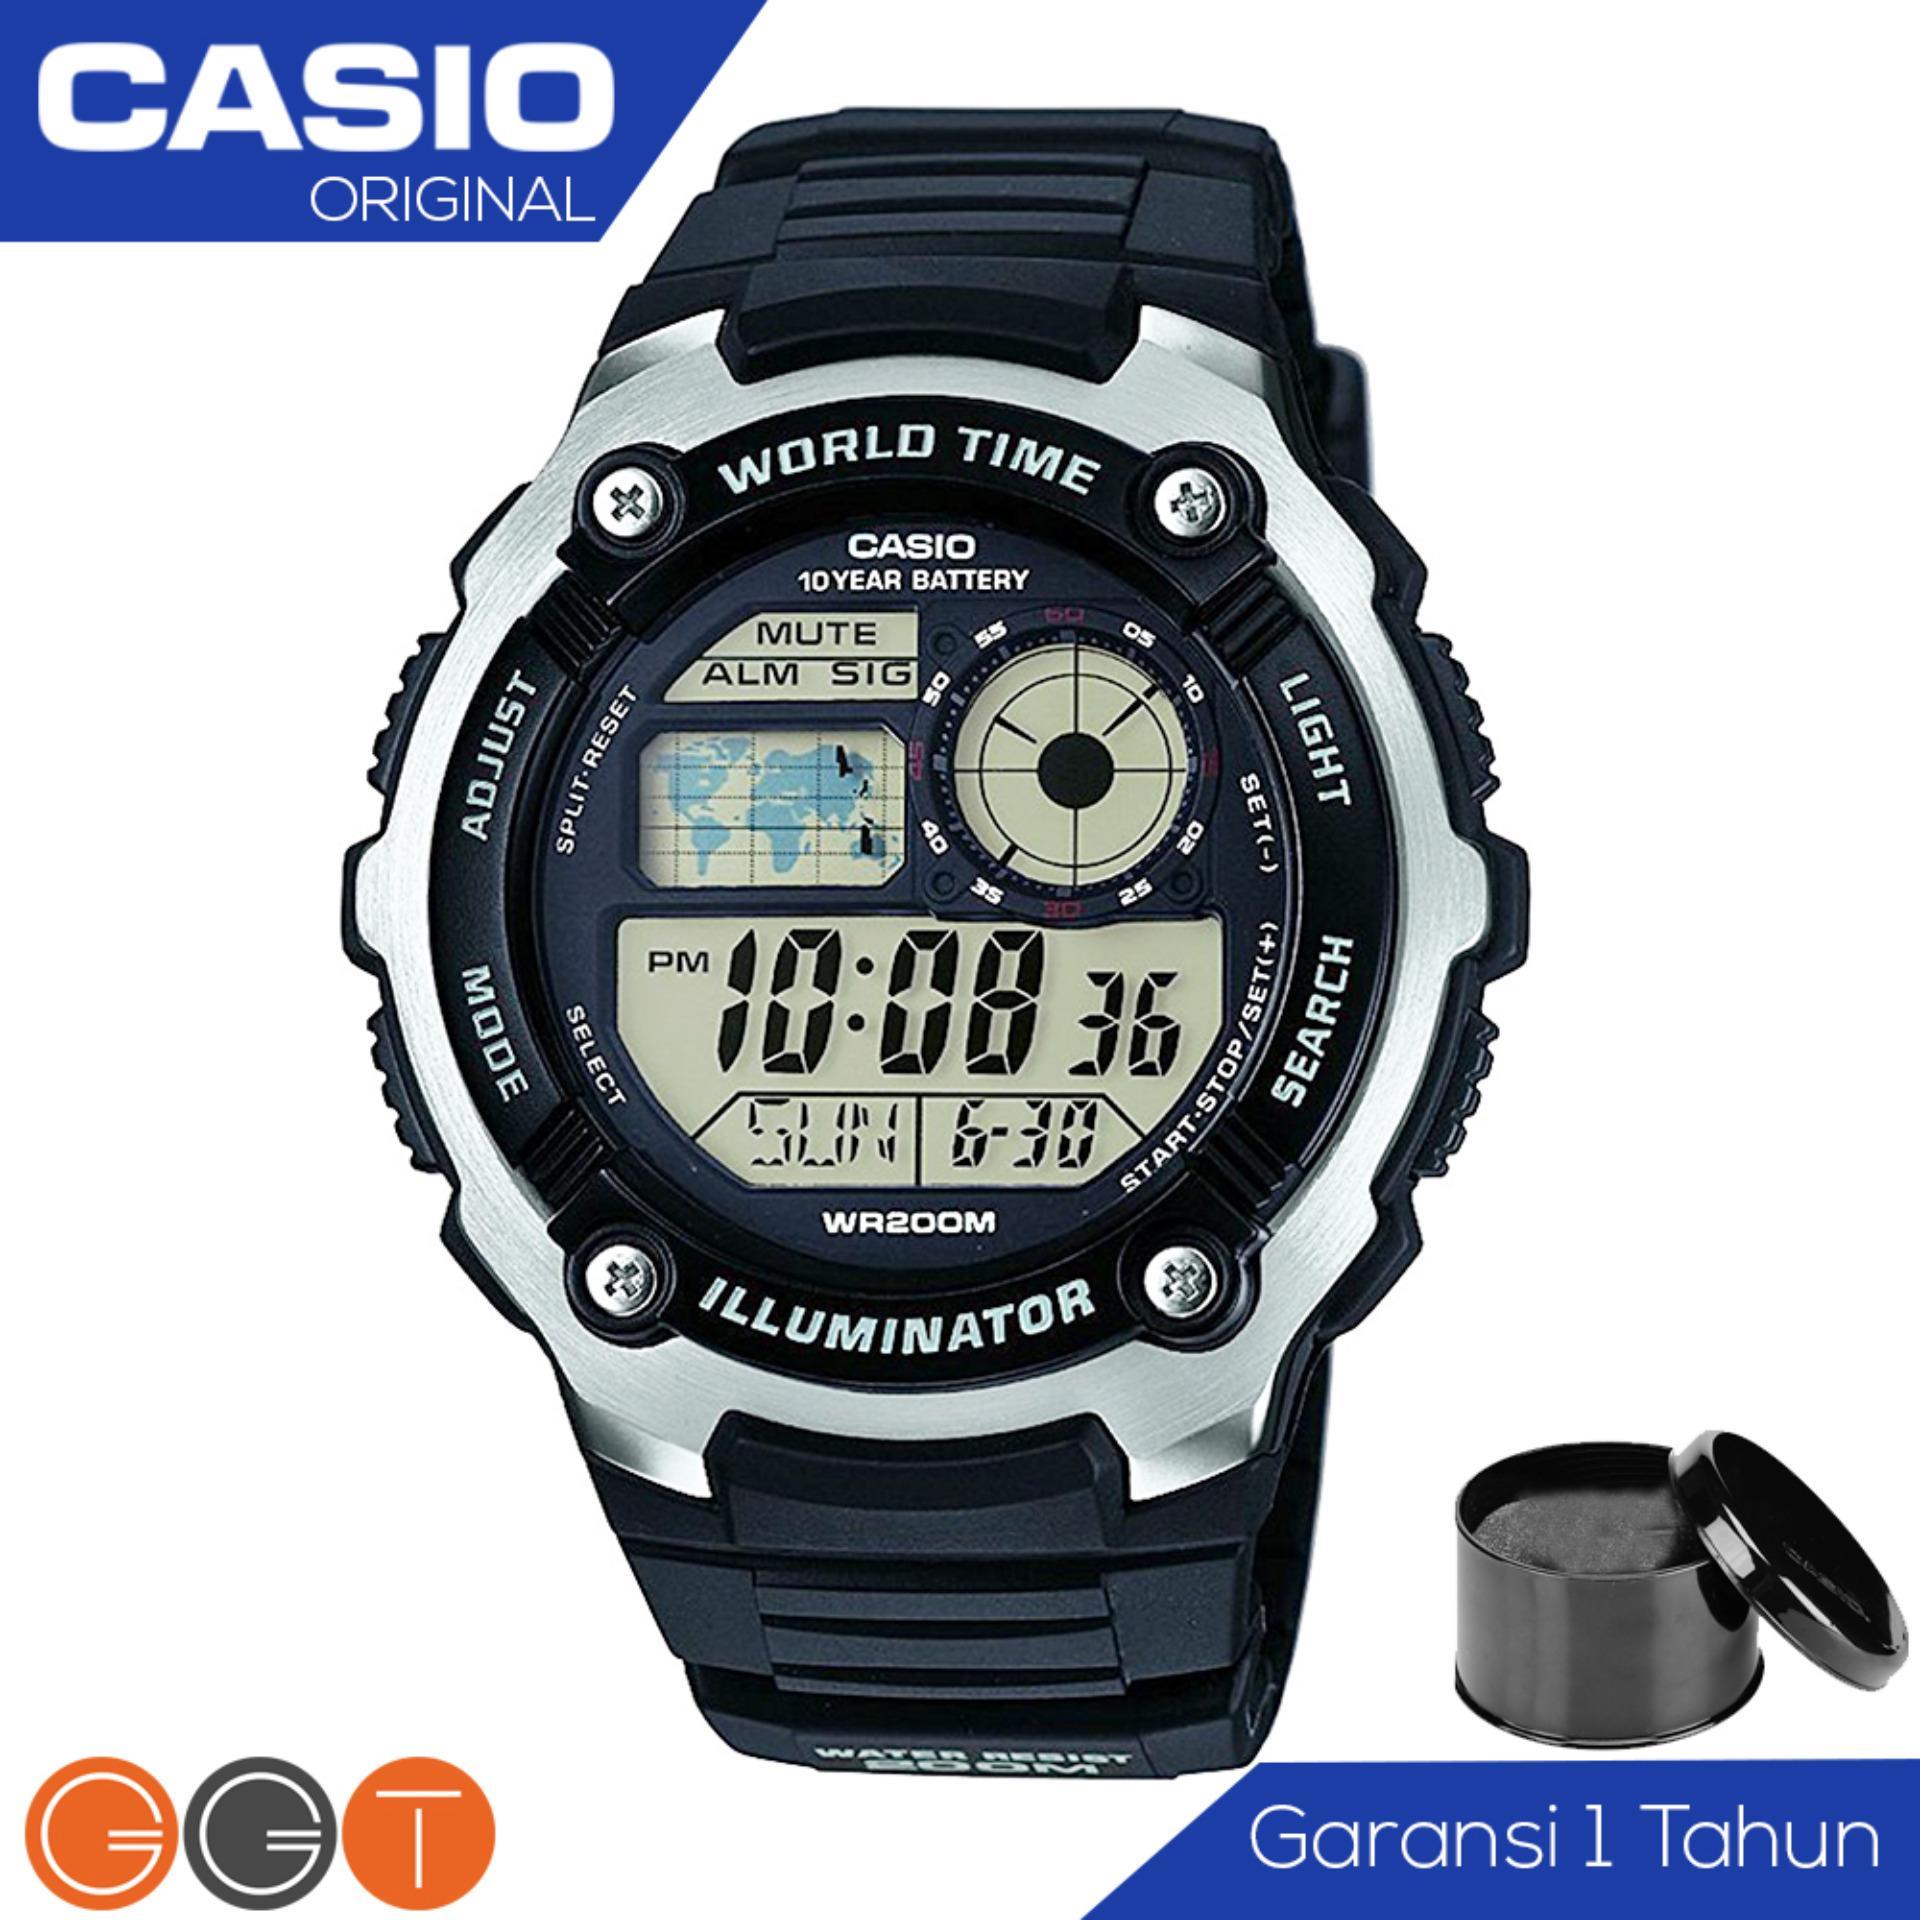 CASIO Illuminator AE-2100W-1AVDF - Jam Tangan Pria - Resin Strap - Digital Movement - Black